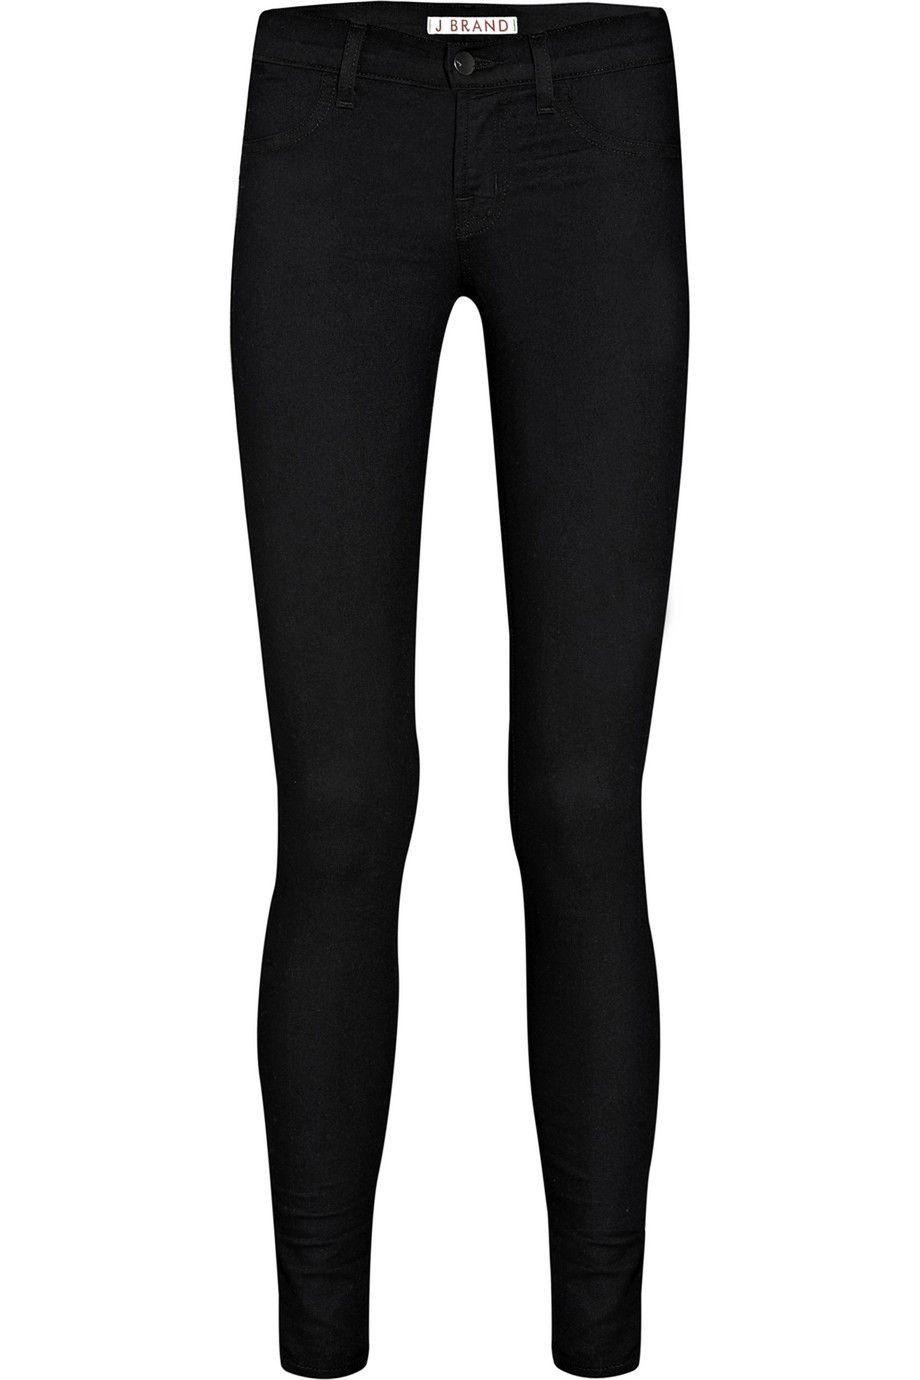 J BRAND 915 low-rise super skinny jeans. #jbrand #cloth #jeans